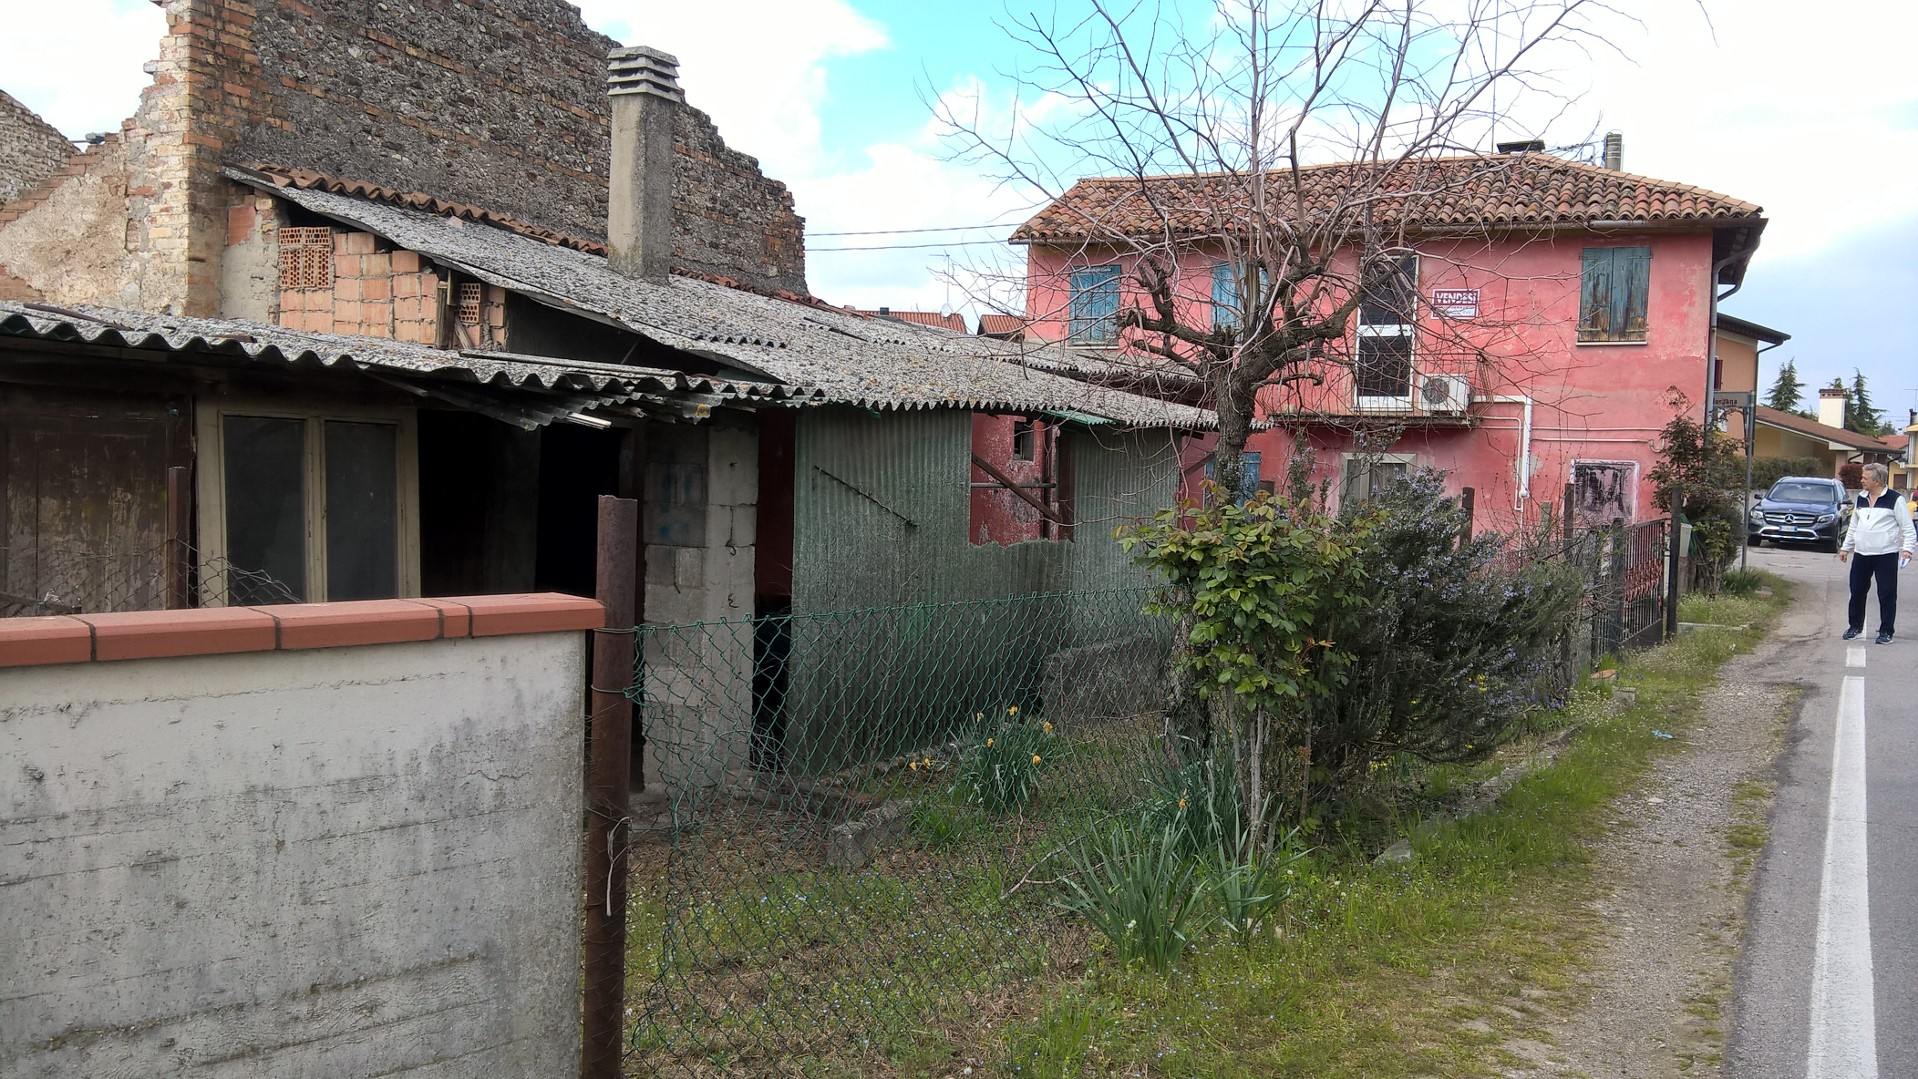 Rustico casale in vendita a paese cod i eb330 for Rustico paese francese